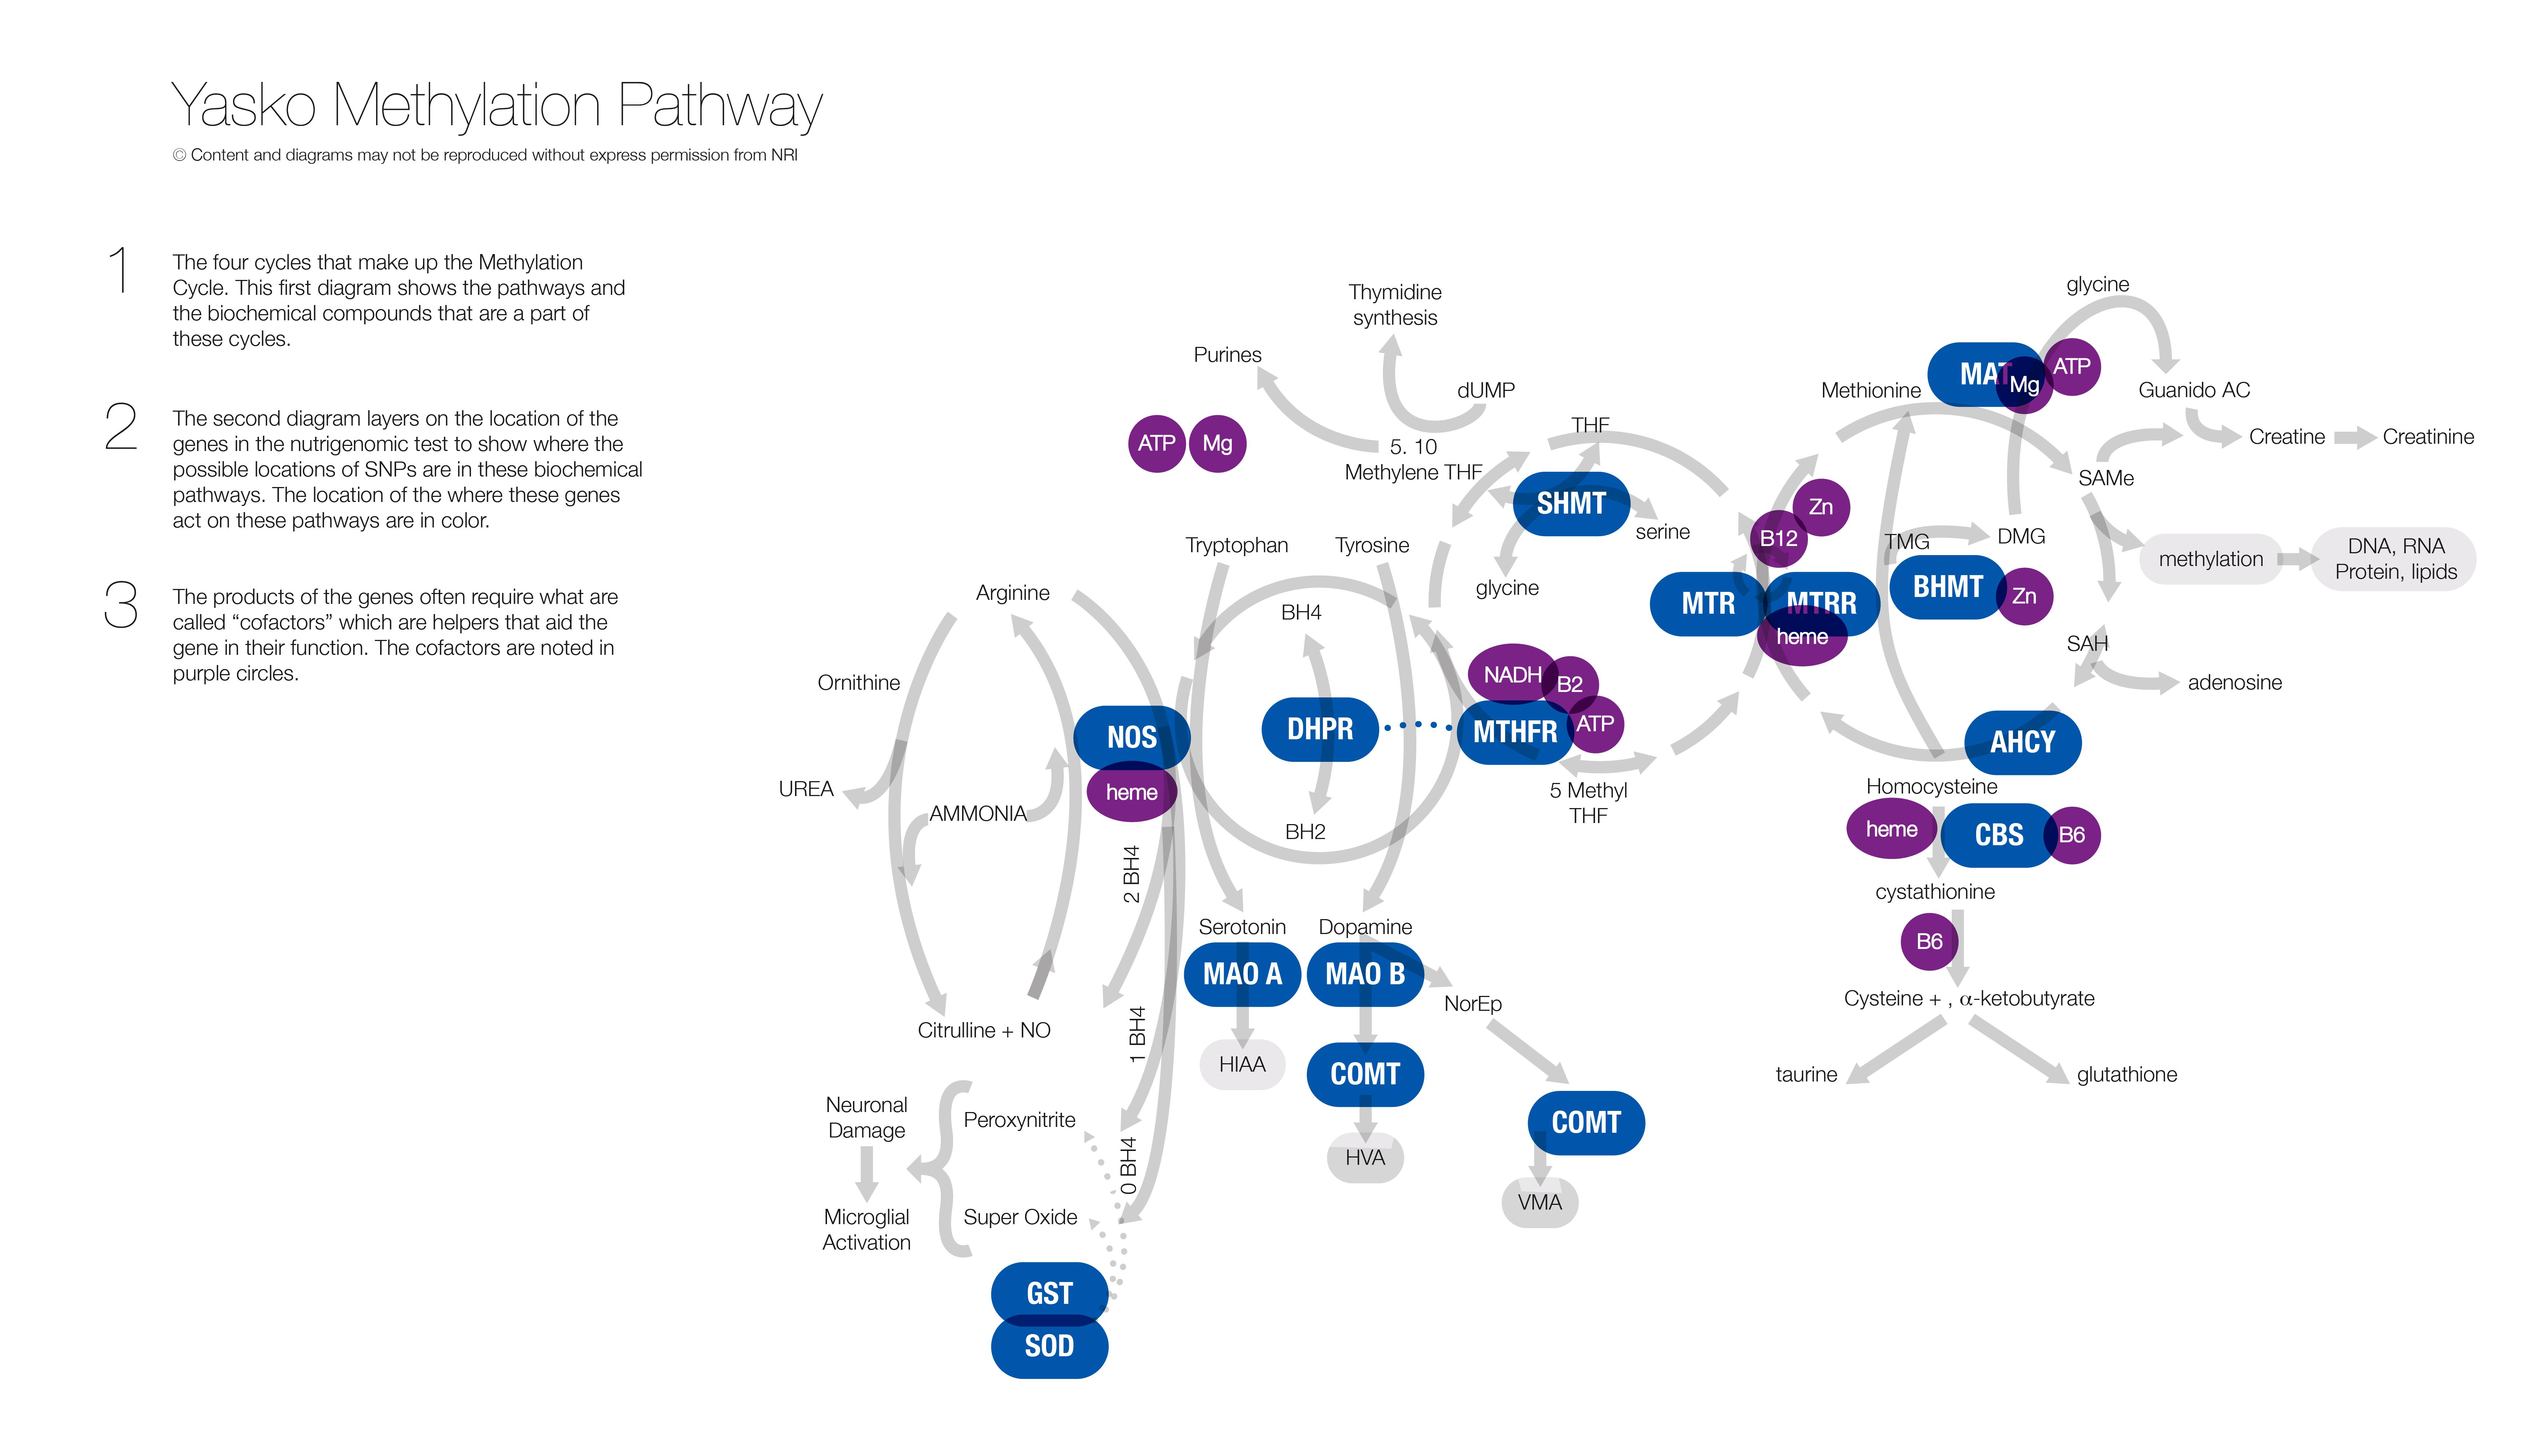 Yasko Methylation Pathway - 3